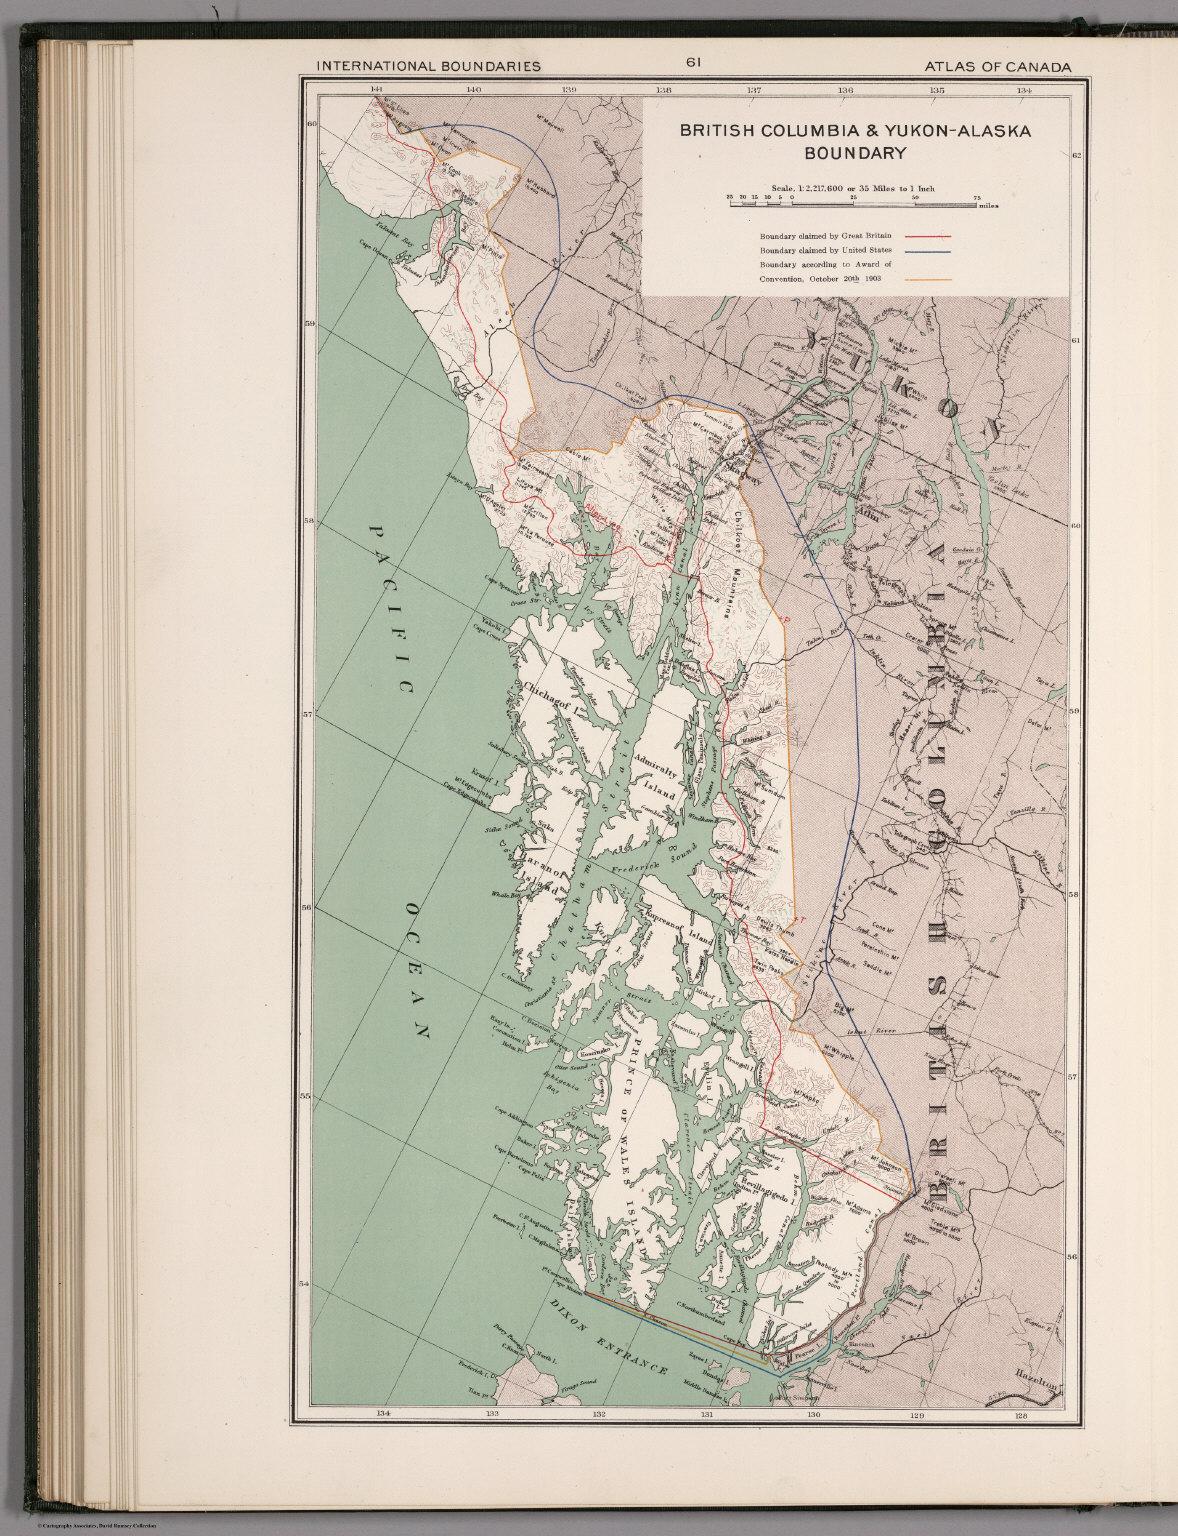 British columbia yukon alaska boundary david rumsey historical georeference this map buy print export gumiabroncs Image collections